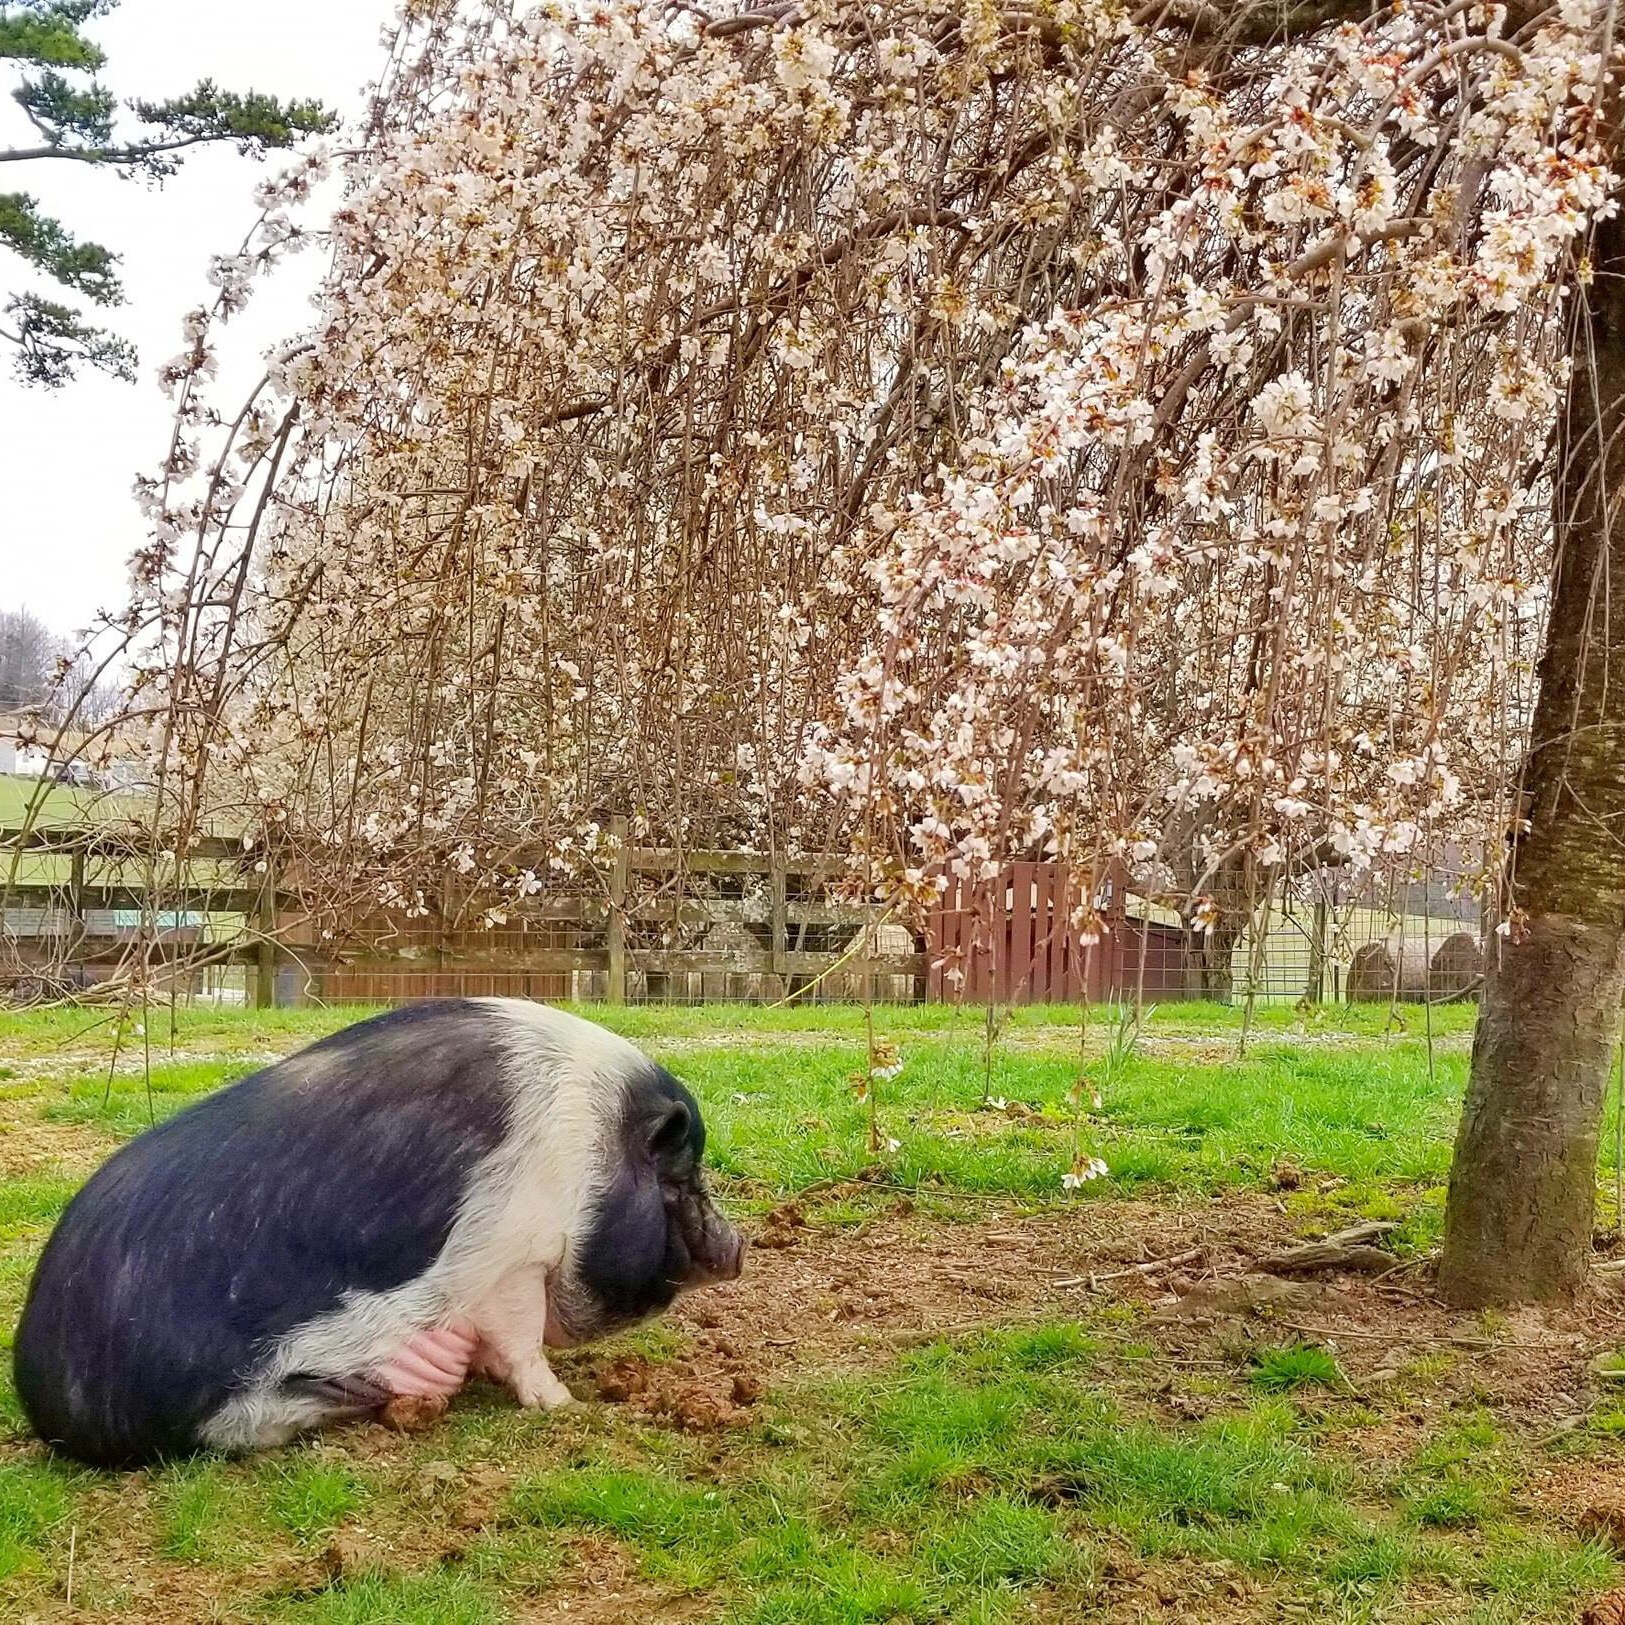 The Pig Preserve